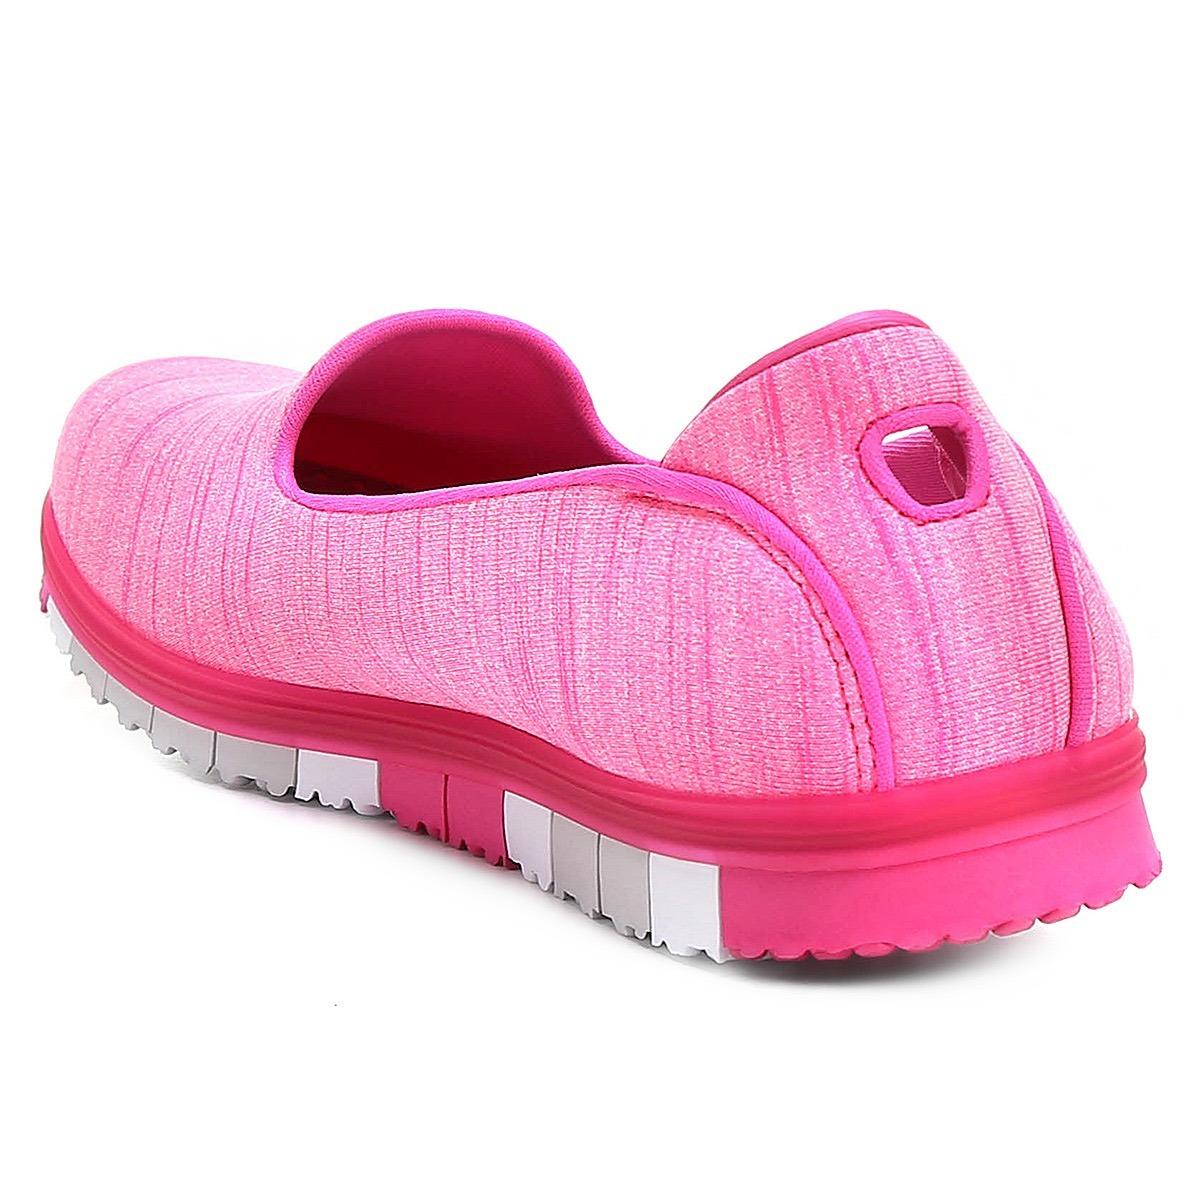 e66ada170ff tênis sapatilha skechers go mini flex walk pink feminina. Carregando zoom.